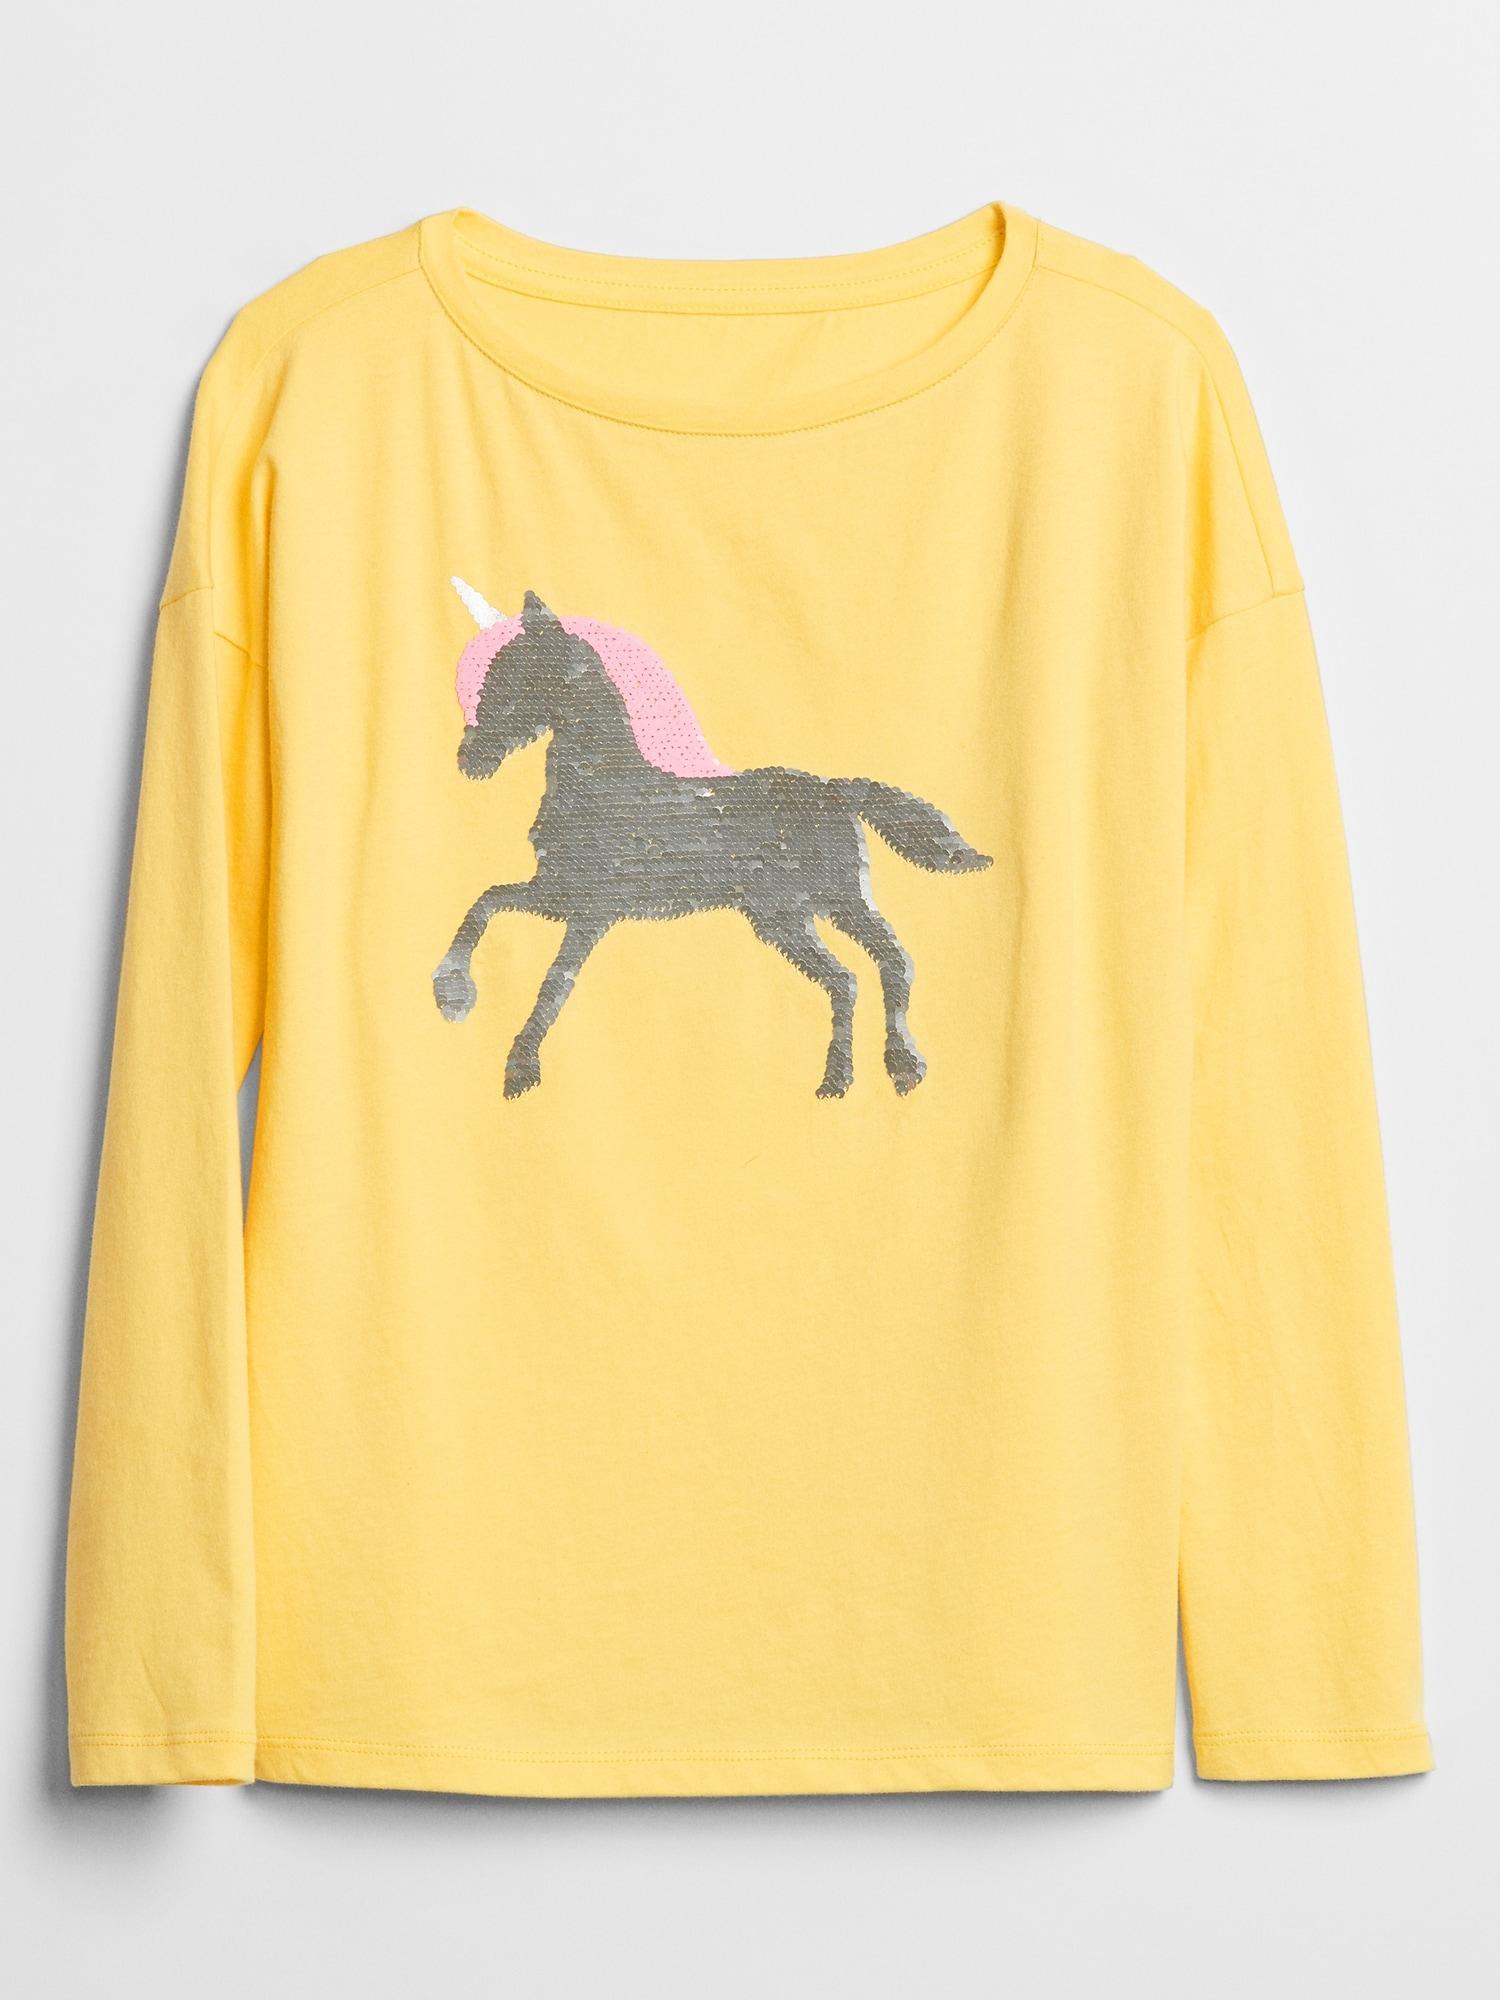 b094525ea Lyst - GAP Factory Kids Flippy Sequin Long Sleeve Graphic T-shirt